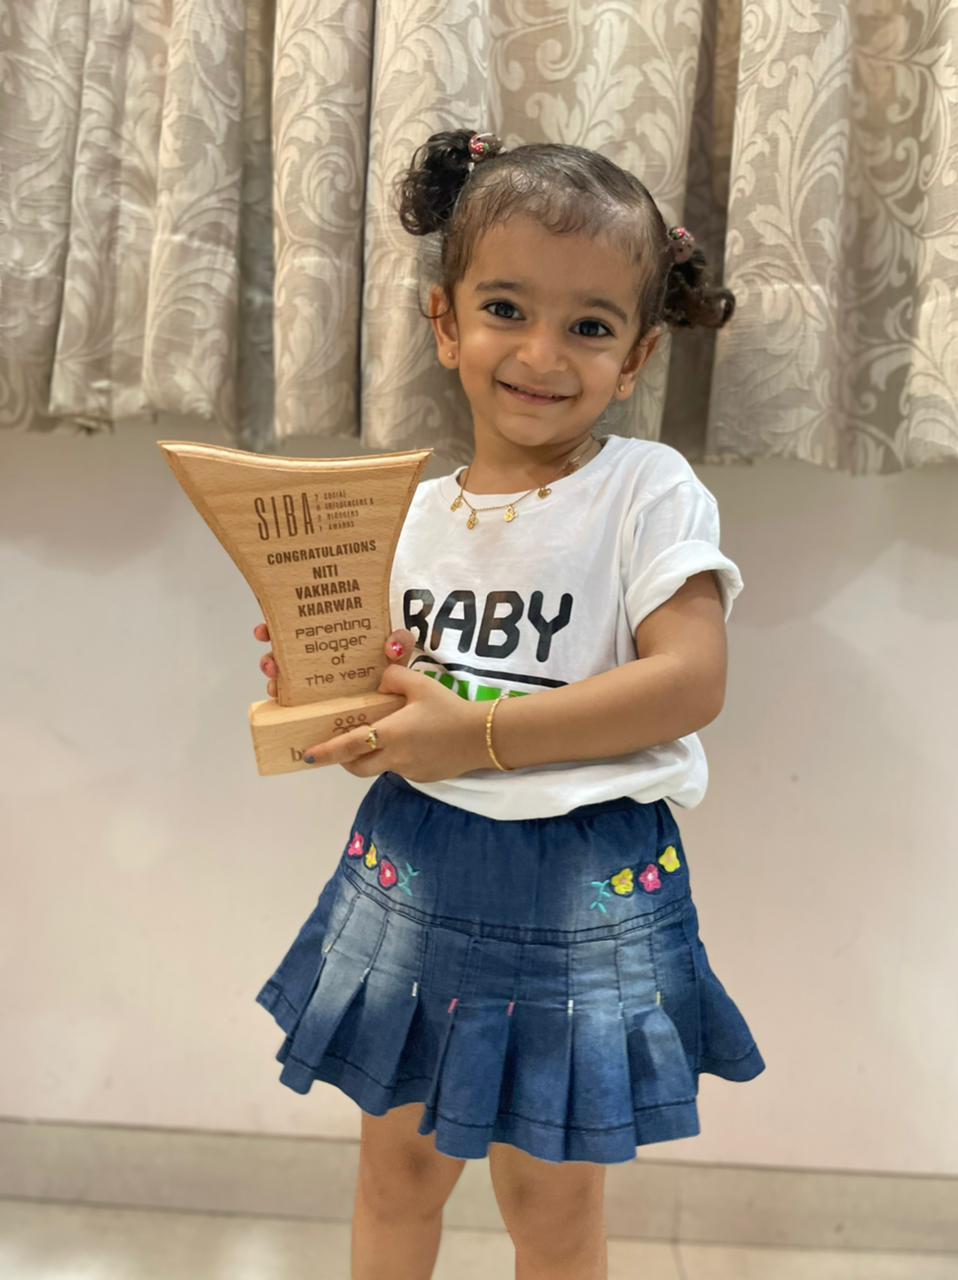 Niti Vakharia Kharwar Bags Parenting Blogger of The Year Award In SIBA Organized By Nirav Chahwala (Brandfluenzers)